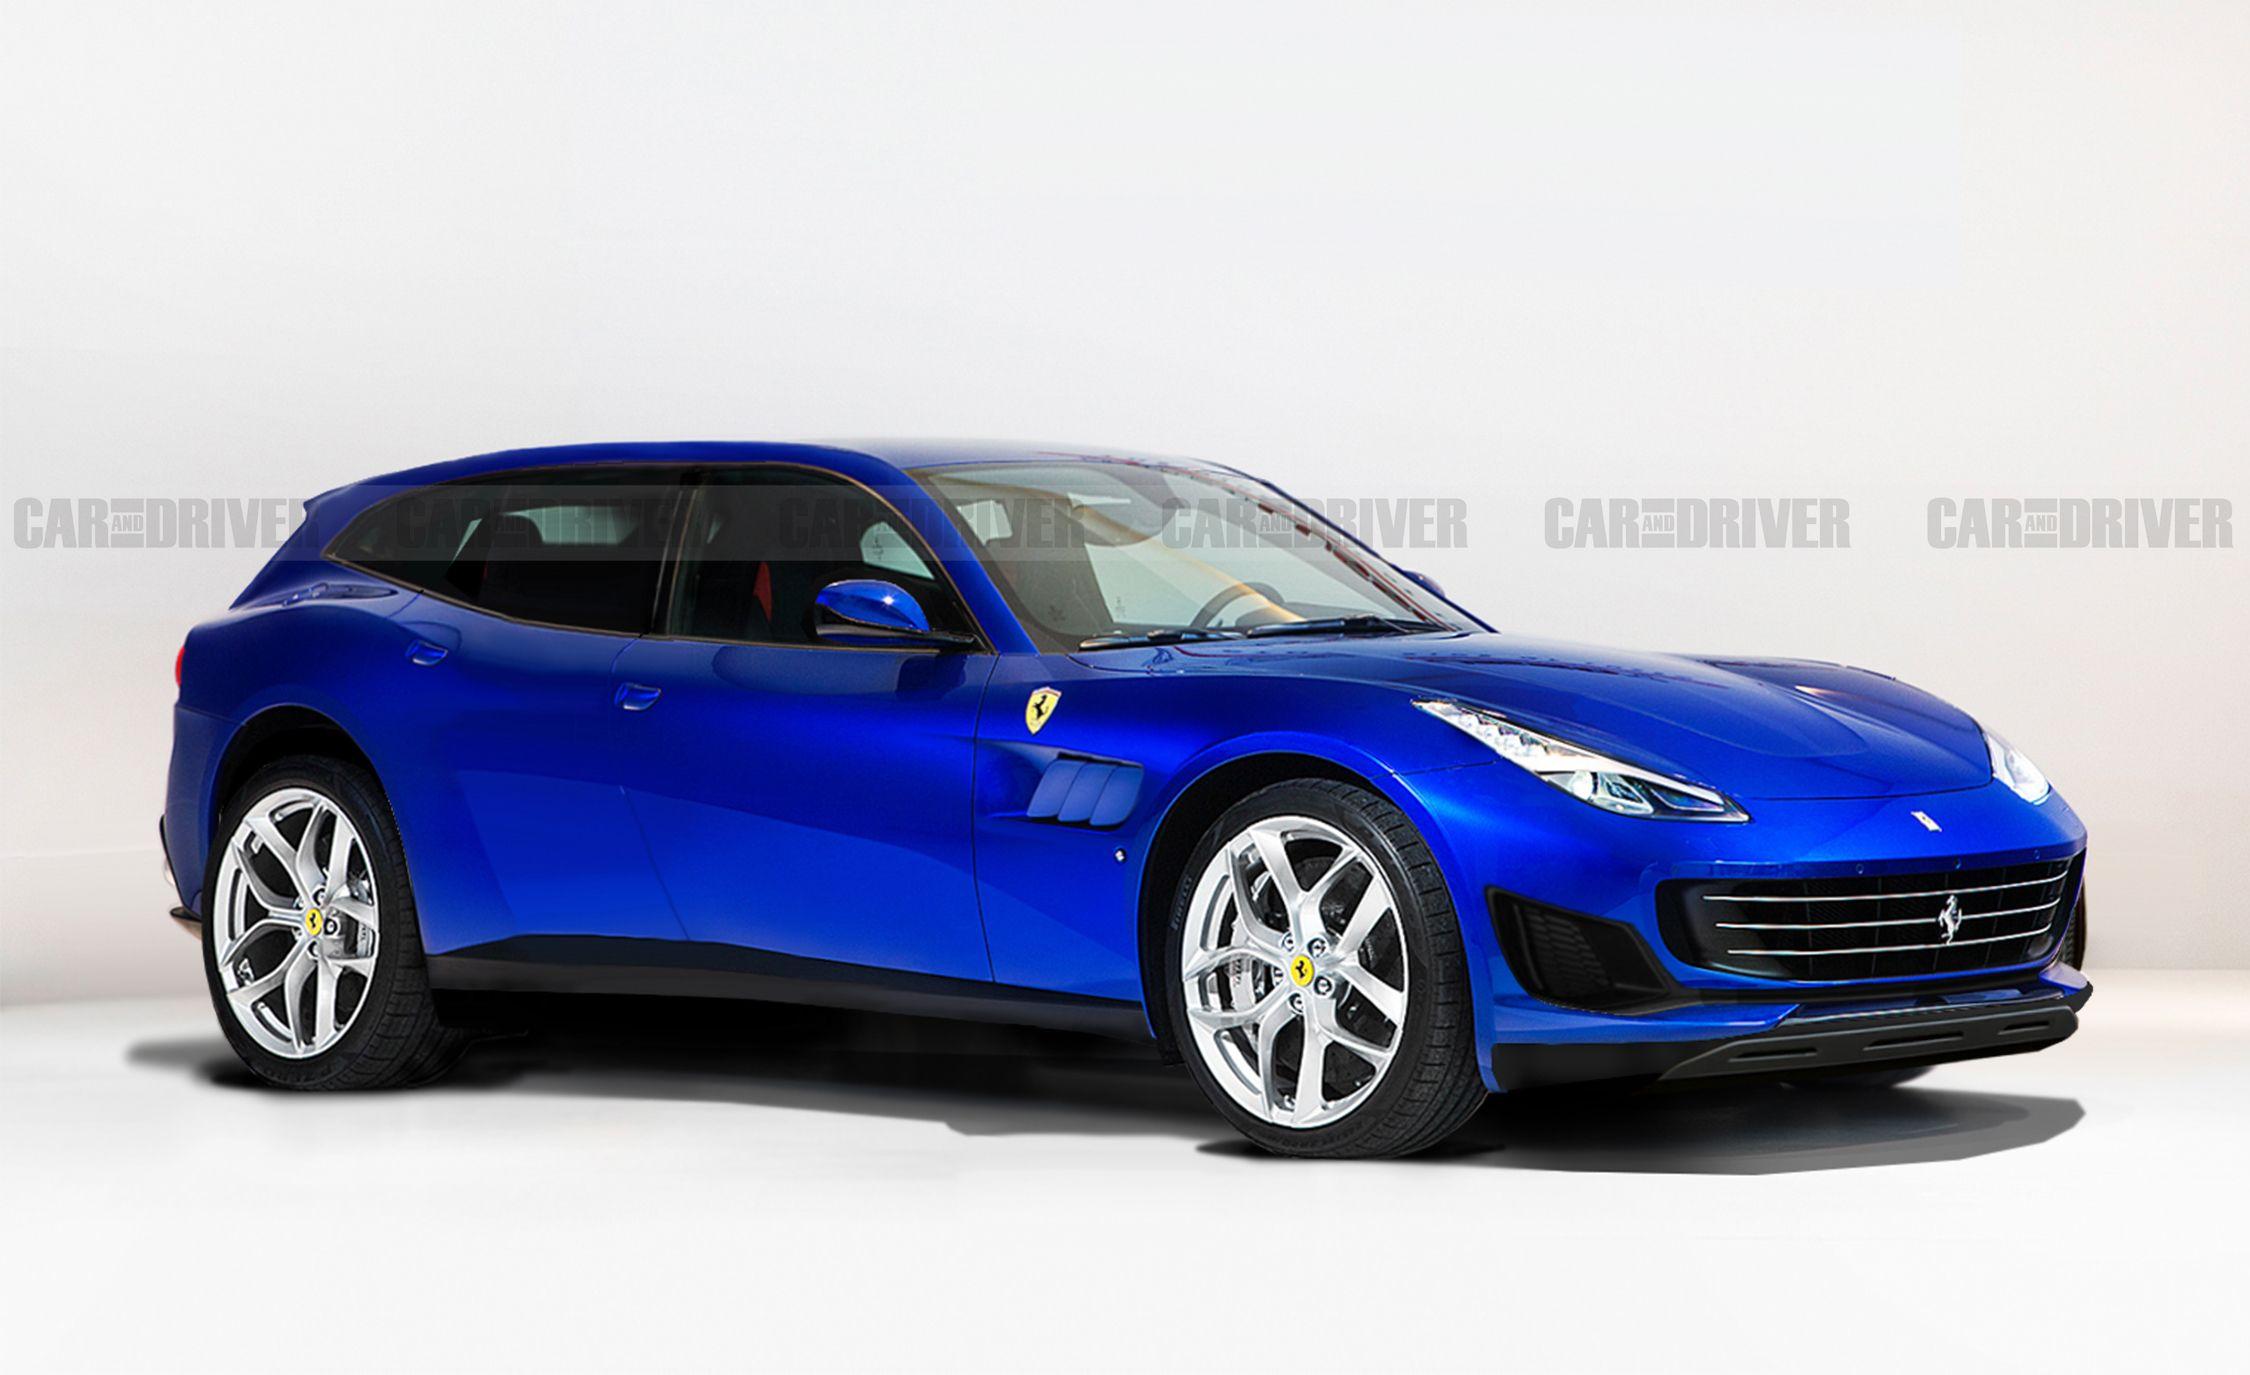 2022 Ferrari Purosangue Review, Pricing, and Specs